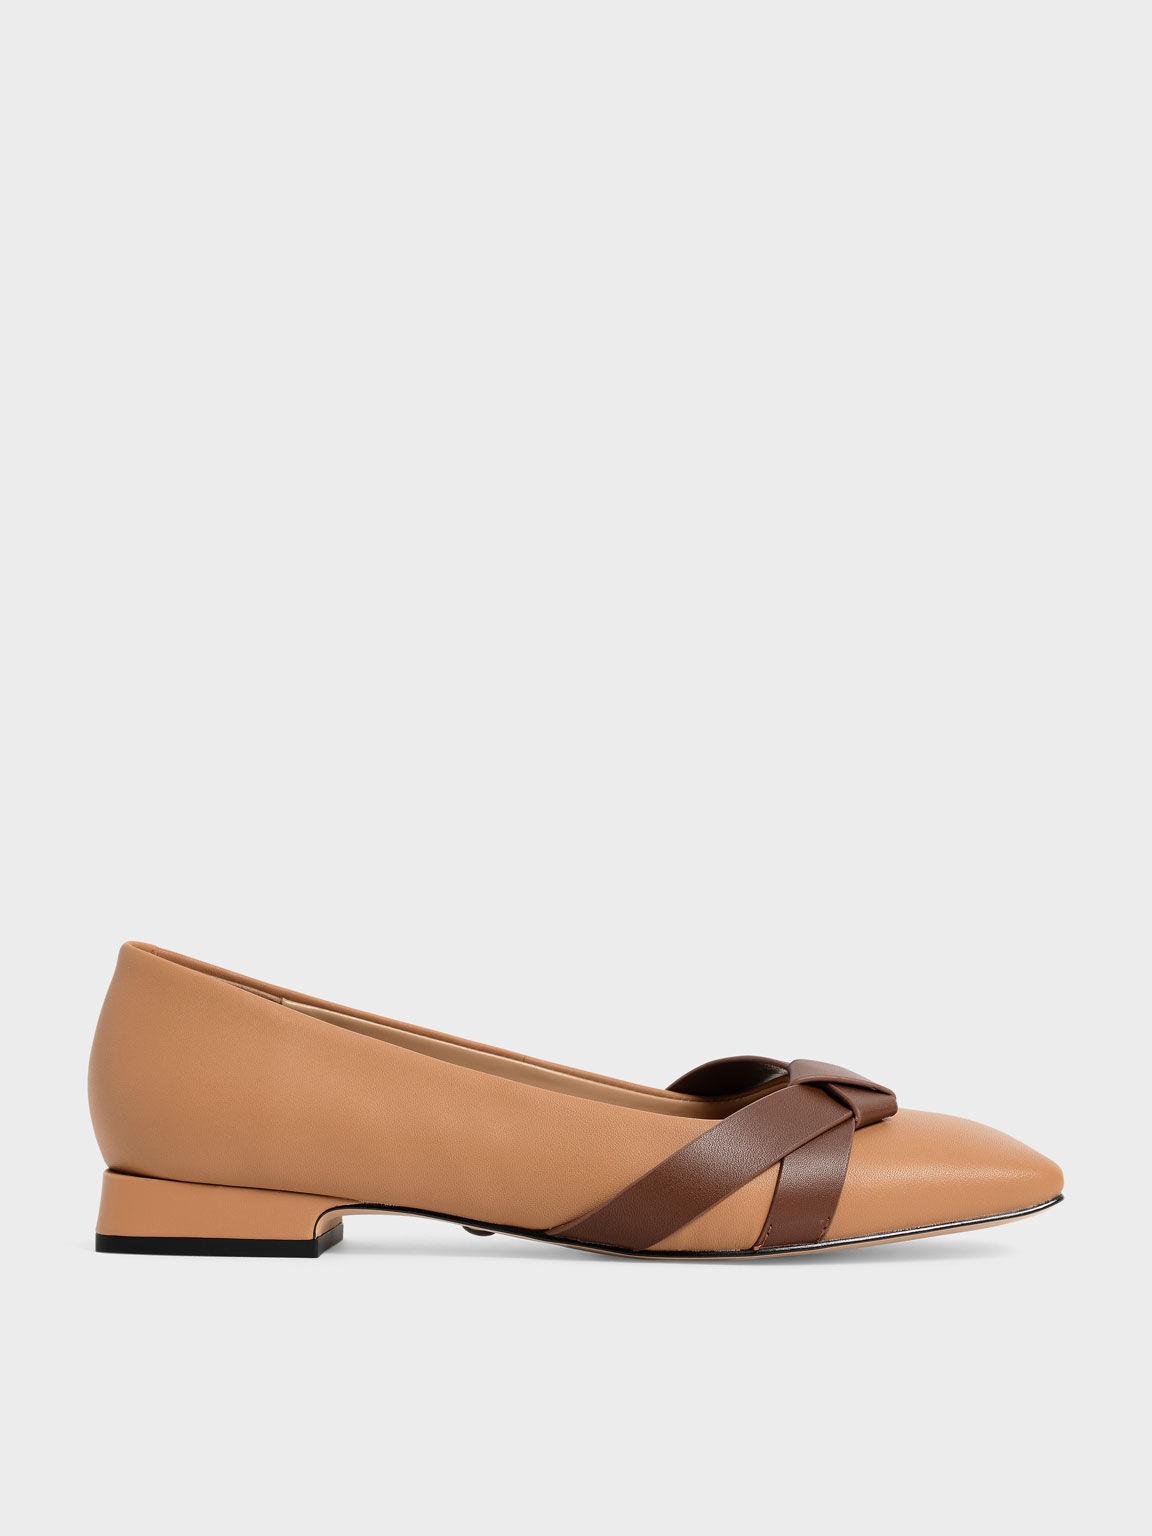 Leather Bow-Tie Ballerinas, Caramel, hi-res